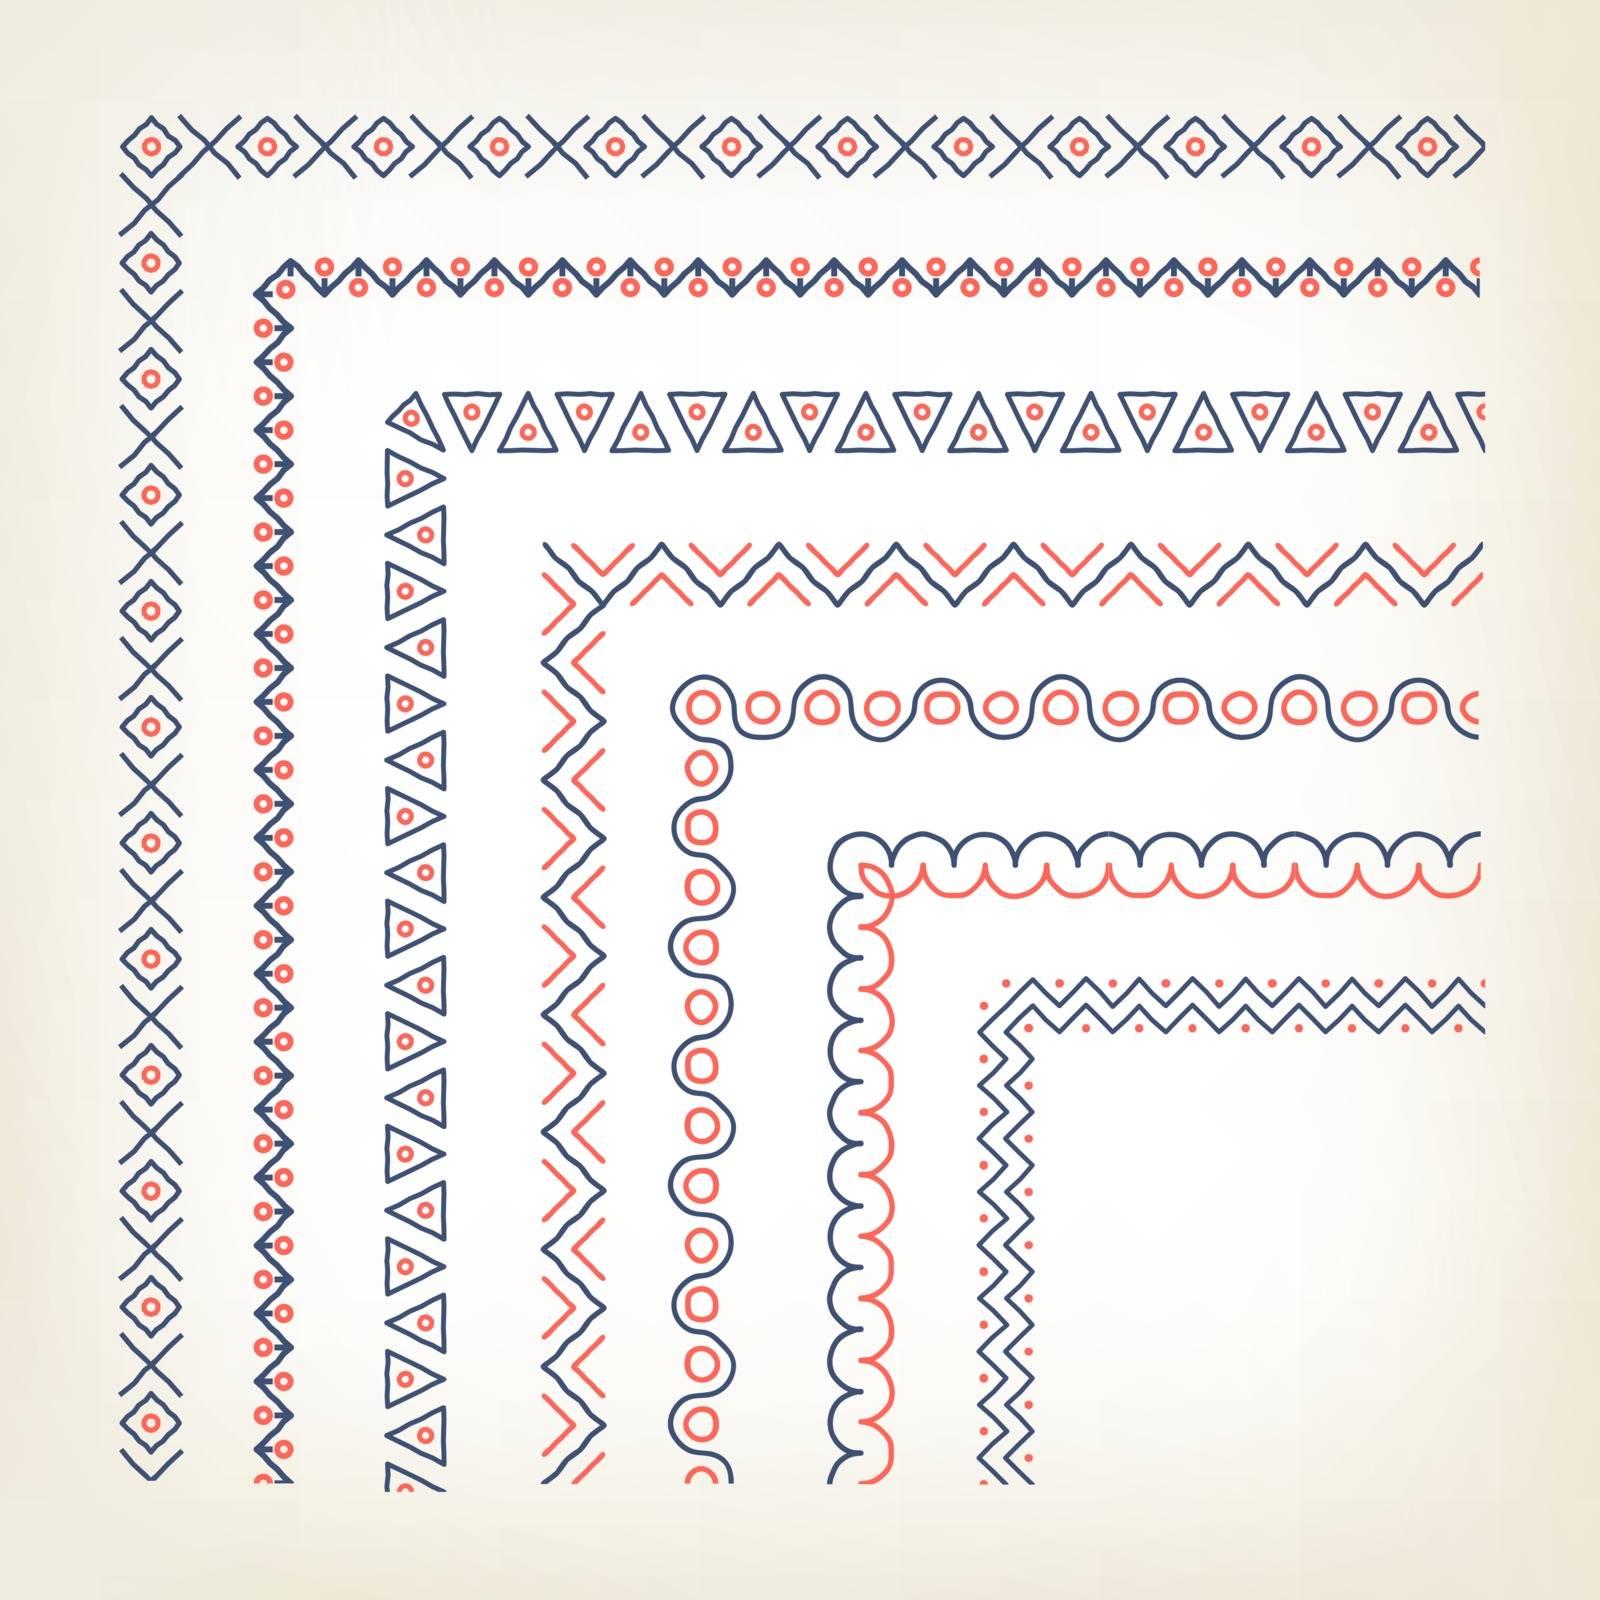 Vercotr set of decorative borders with corner elements